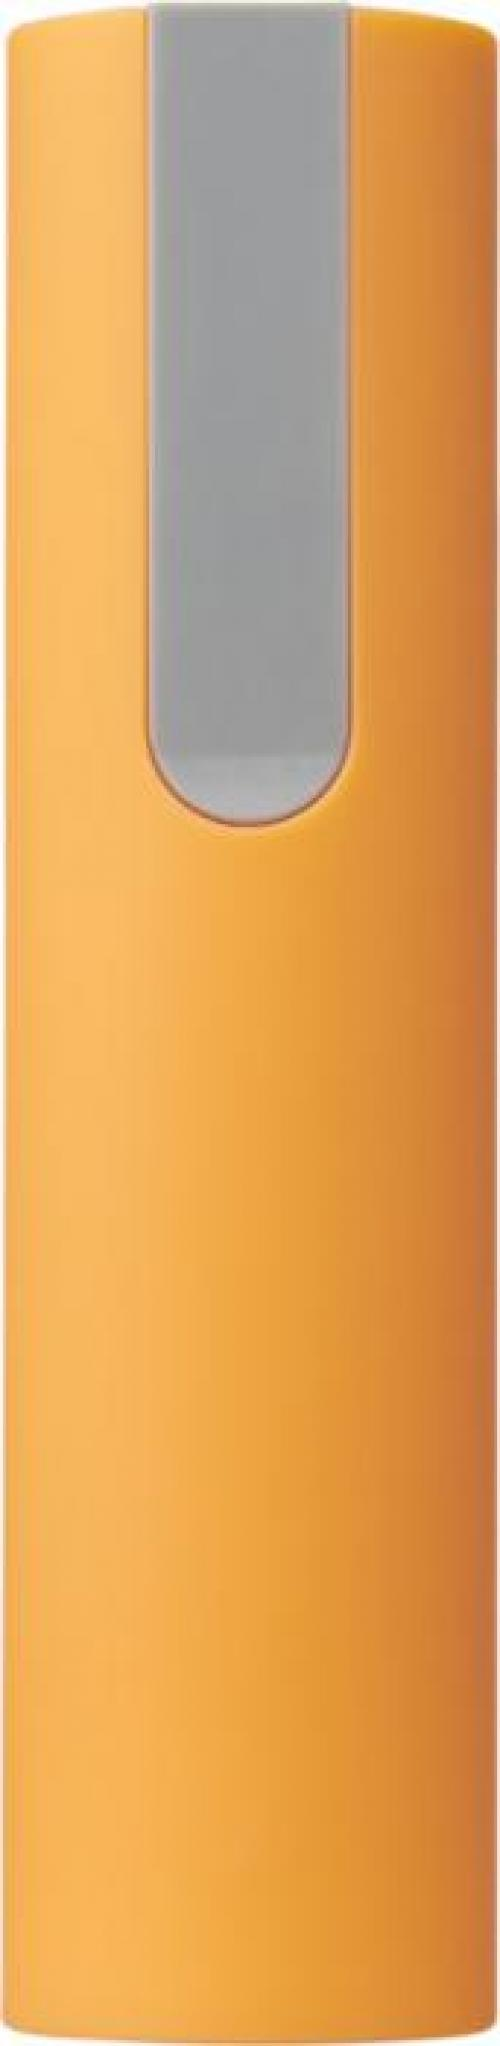 Mini Power bank cilíndrico 2200mAh para smartphone Jinn